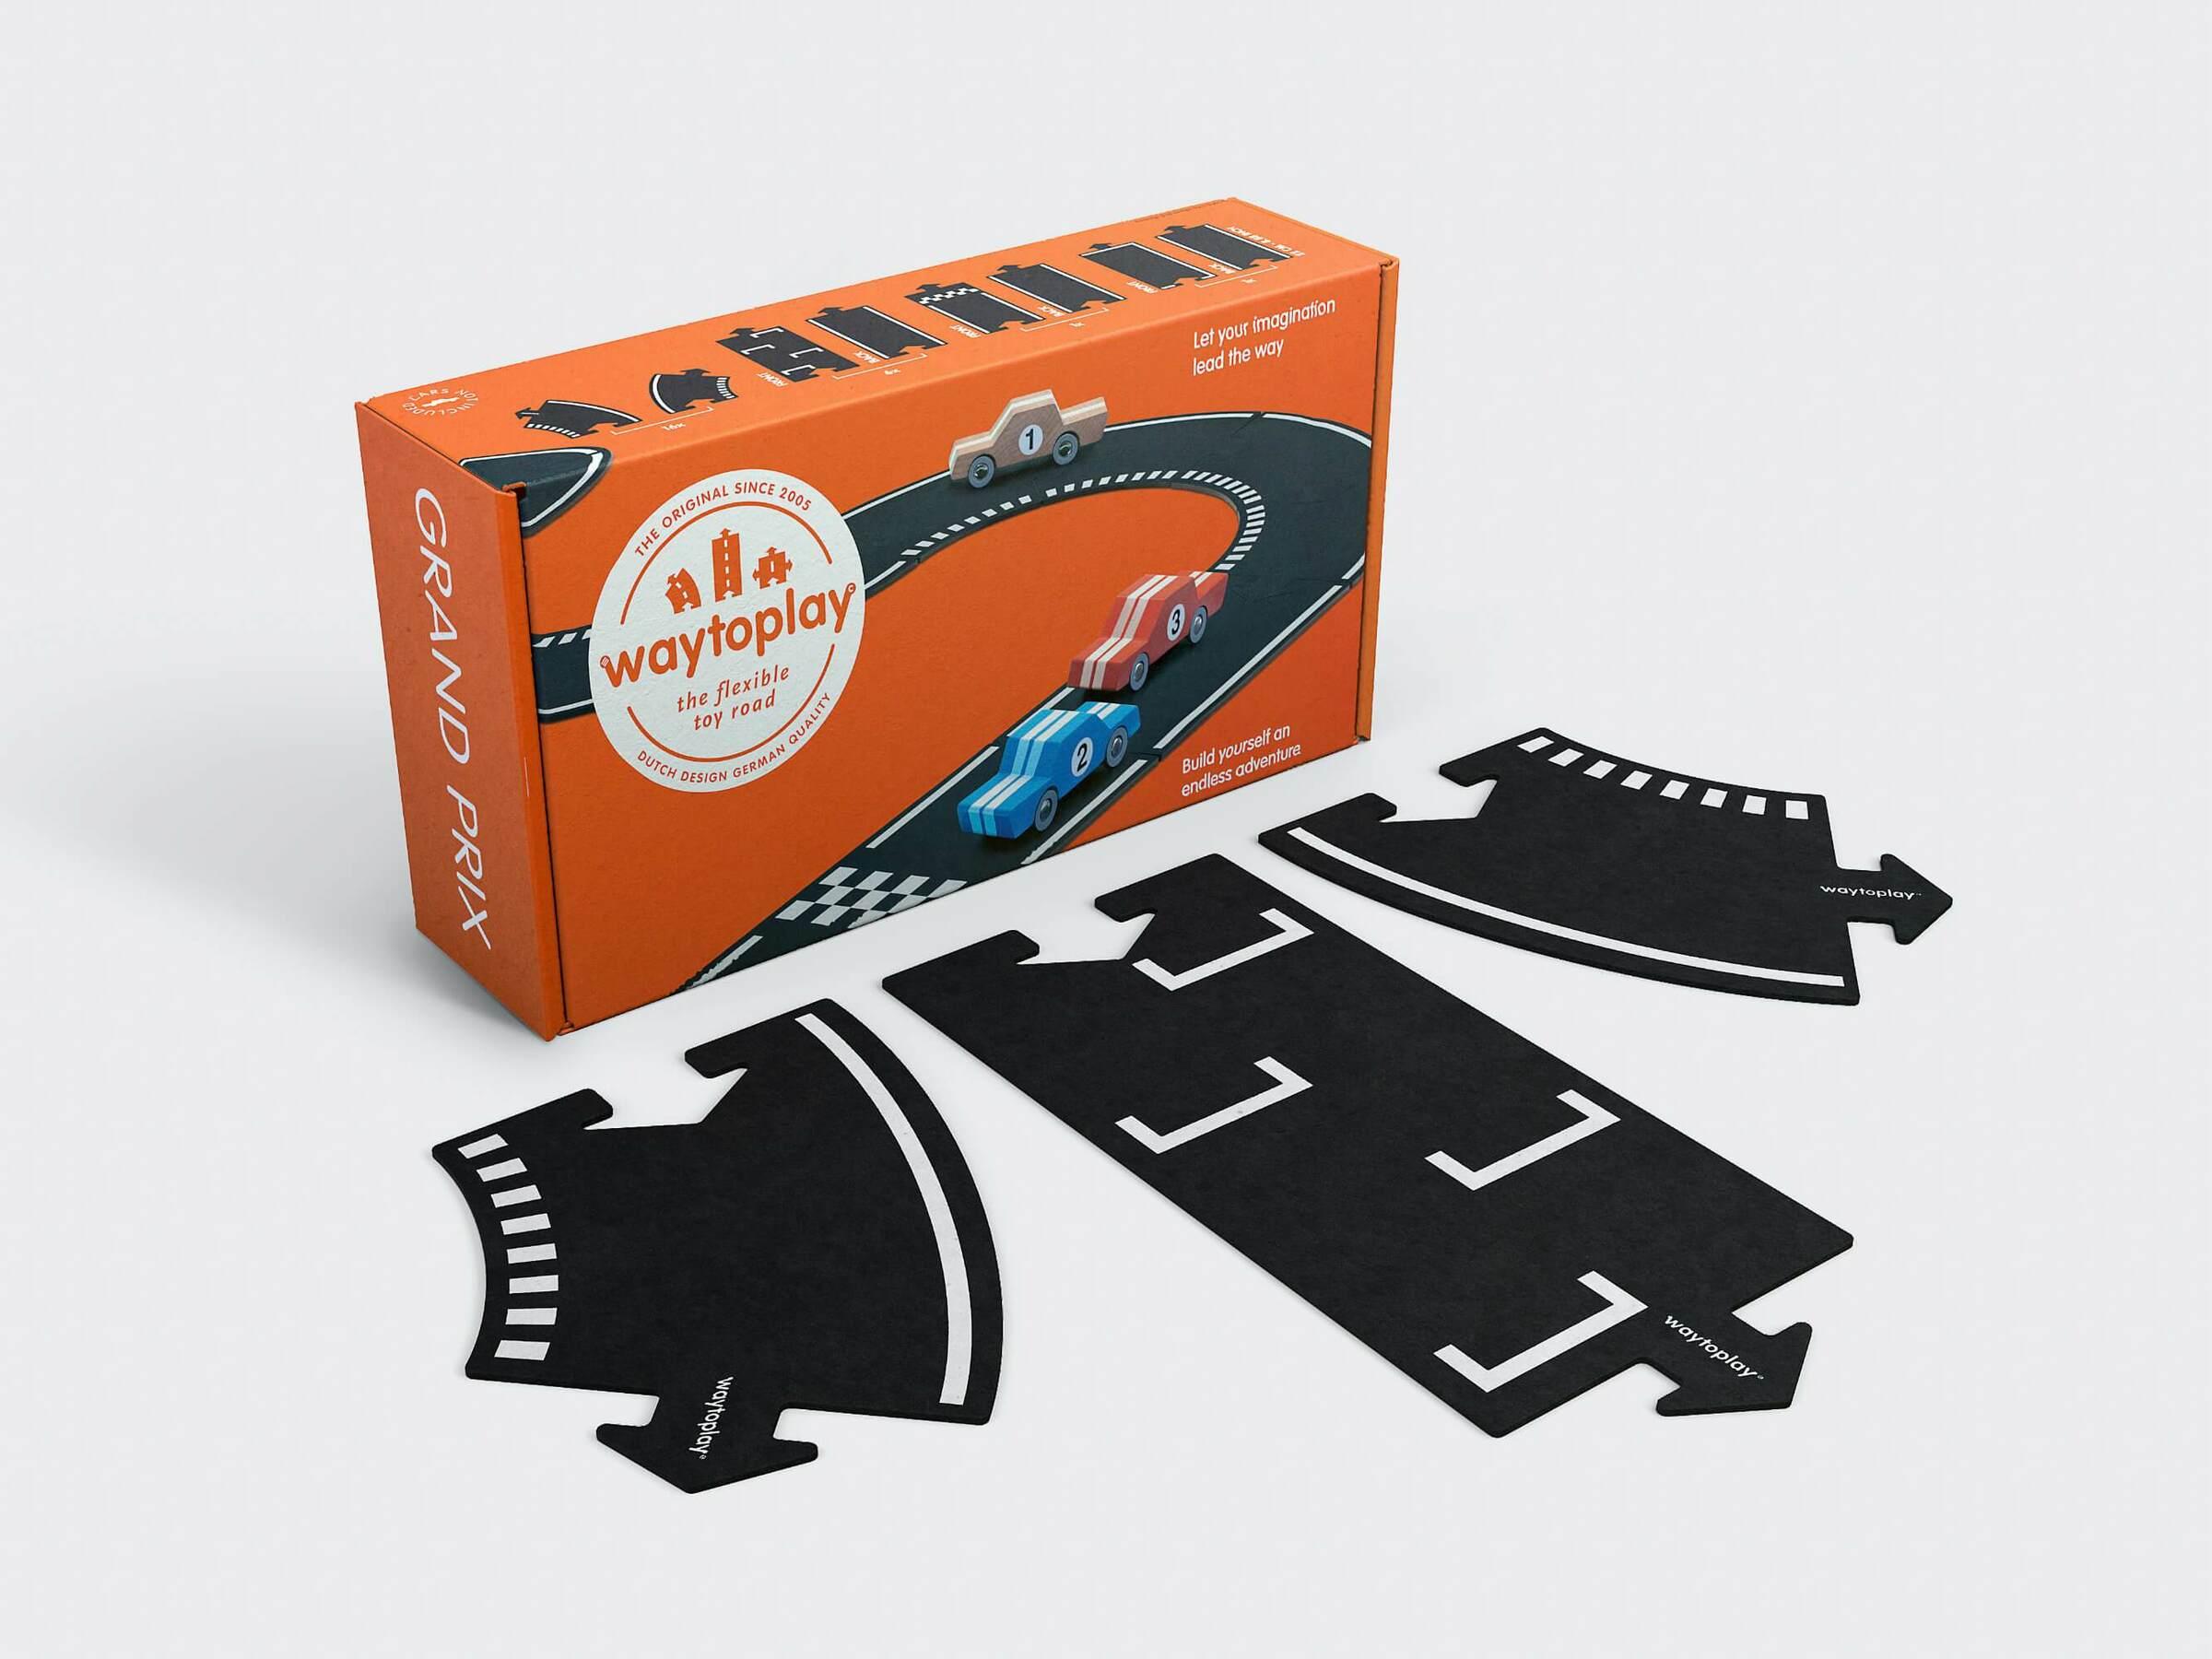 waytoplay-toys_flexible-toy-road_grand-prix-1-packaging.jpeg